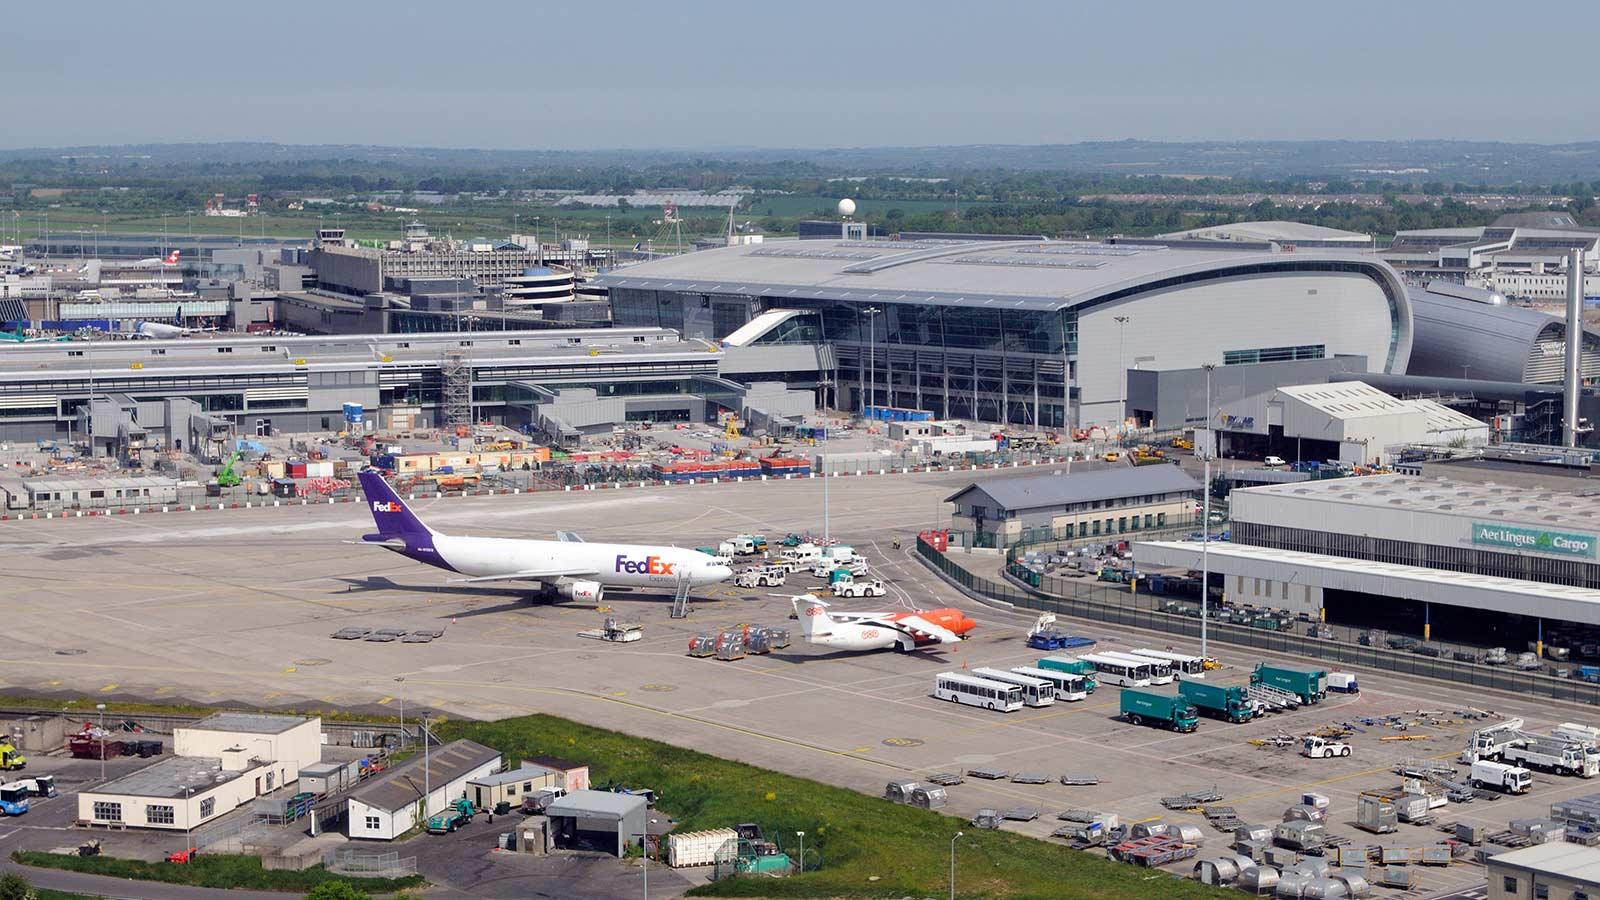 https://www.macegroup.com/-/media/mace-dotcom/images/projects/dublin-airport/dublinairport_4.ashx?w=1600&h=900&as=1&crop=1&hash=B13885611DE3F61FC1E76CE2B6C9EACF493F1CB9